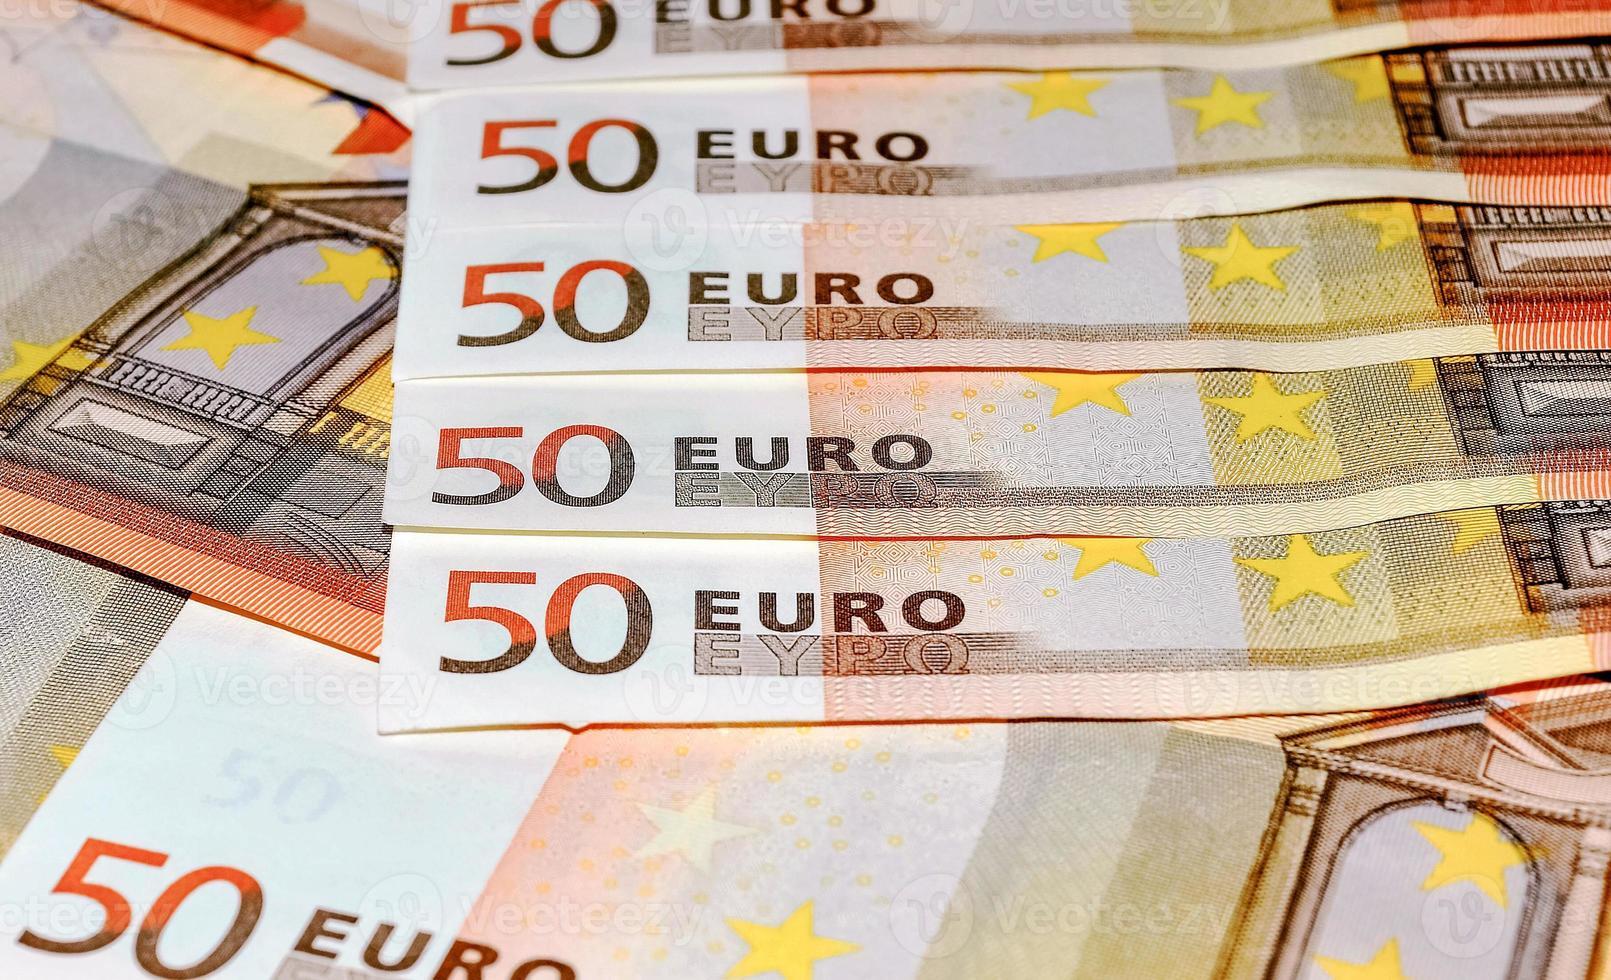 eurobankbiljetten, vijftig, close-up foto